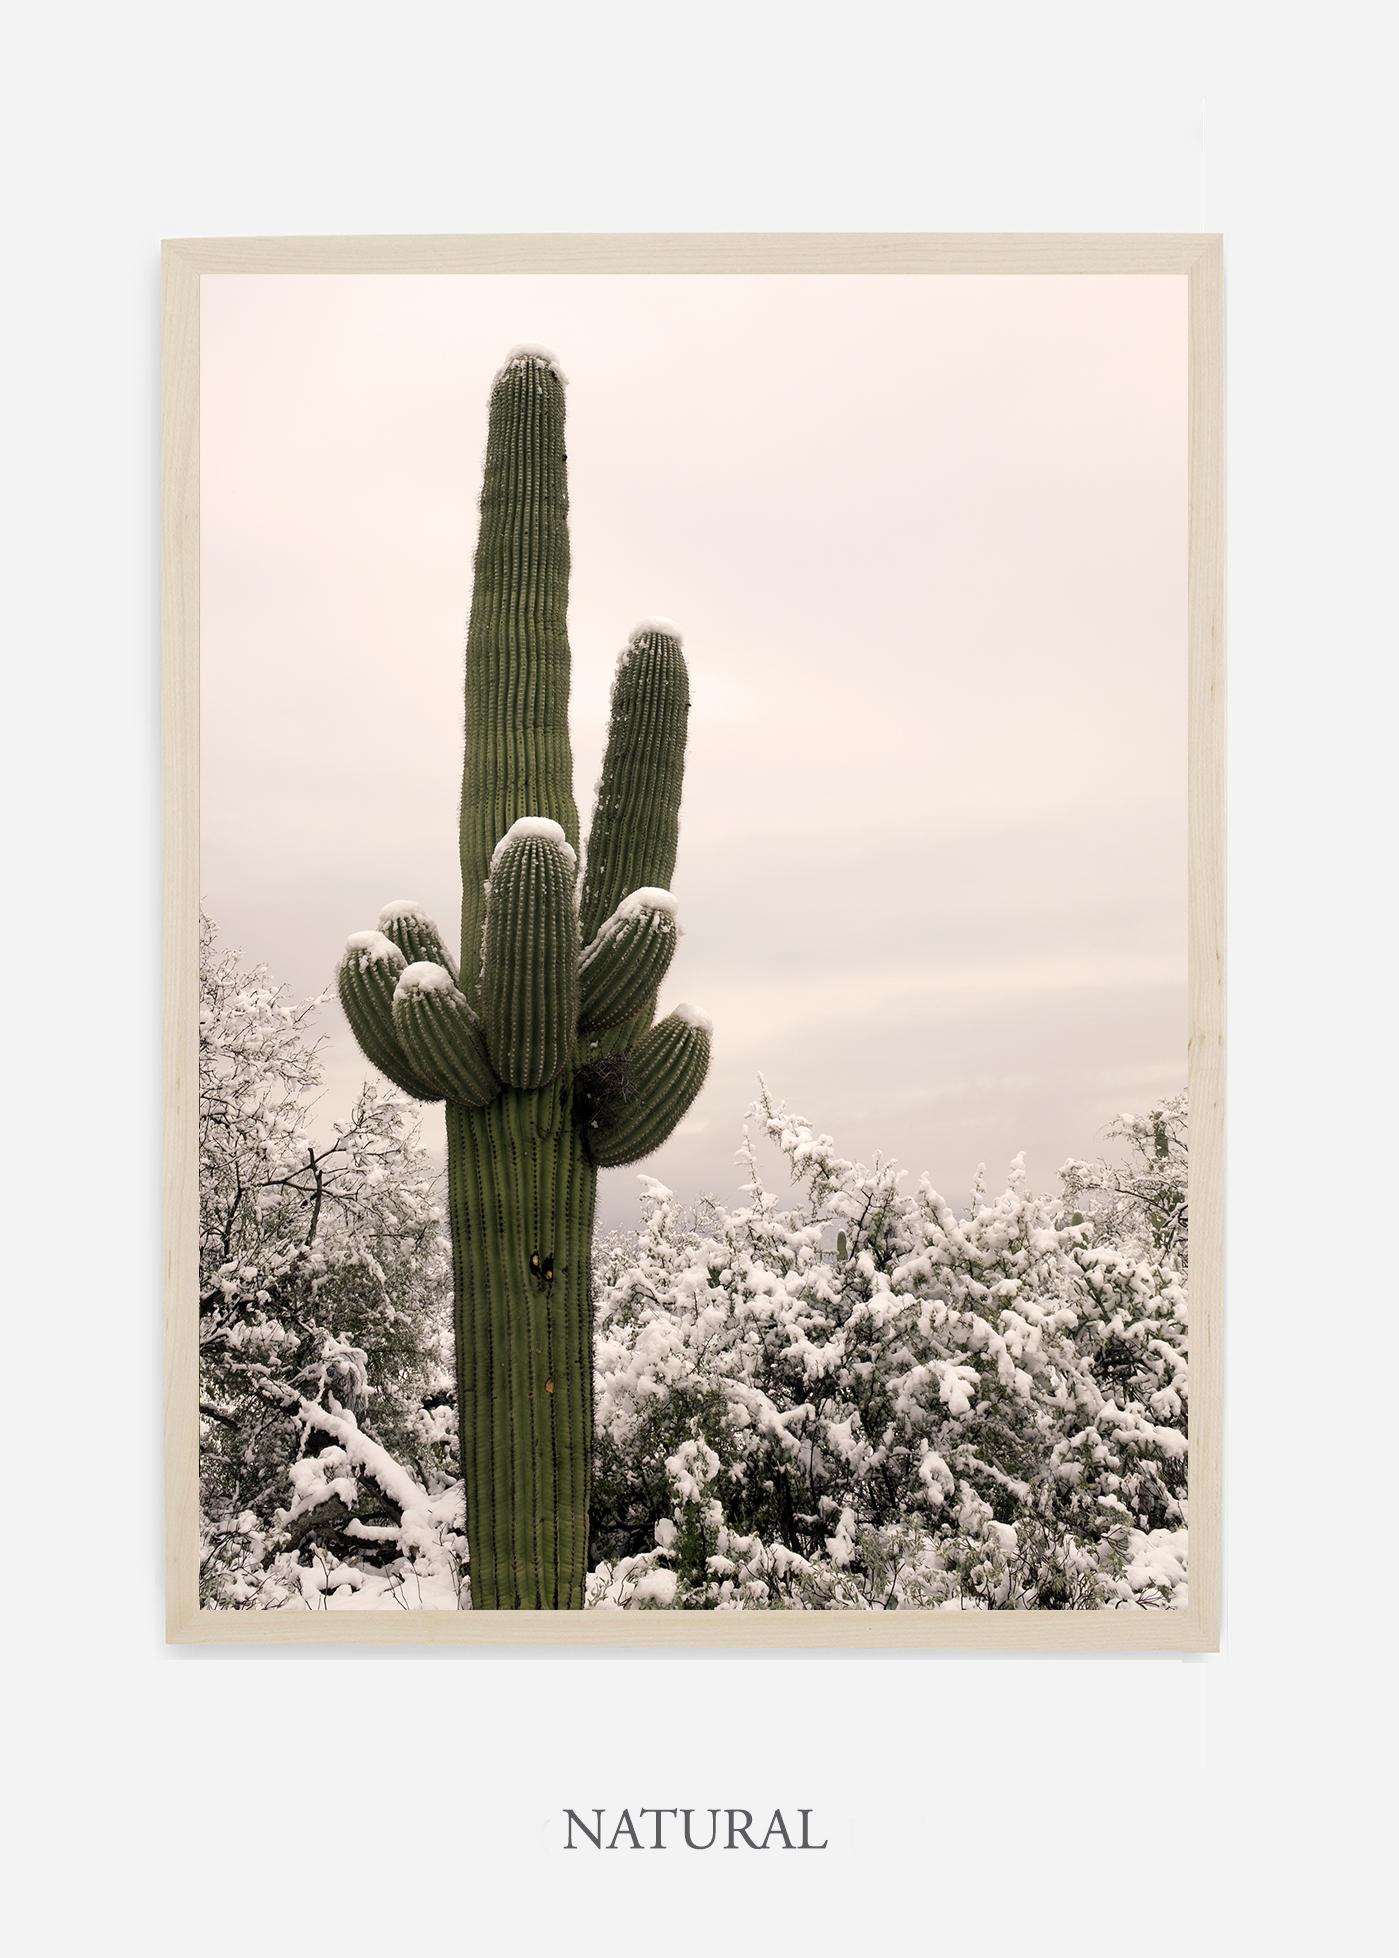 nomat-naturalframe-saguaroNo.6-wildercalifornia-art-wallart-cactusprint-homedecor-prints-arizona-botanical-artwork-interiordesign.jpg